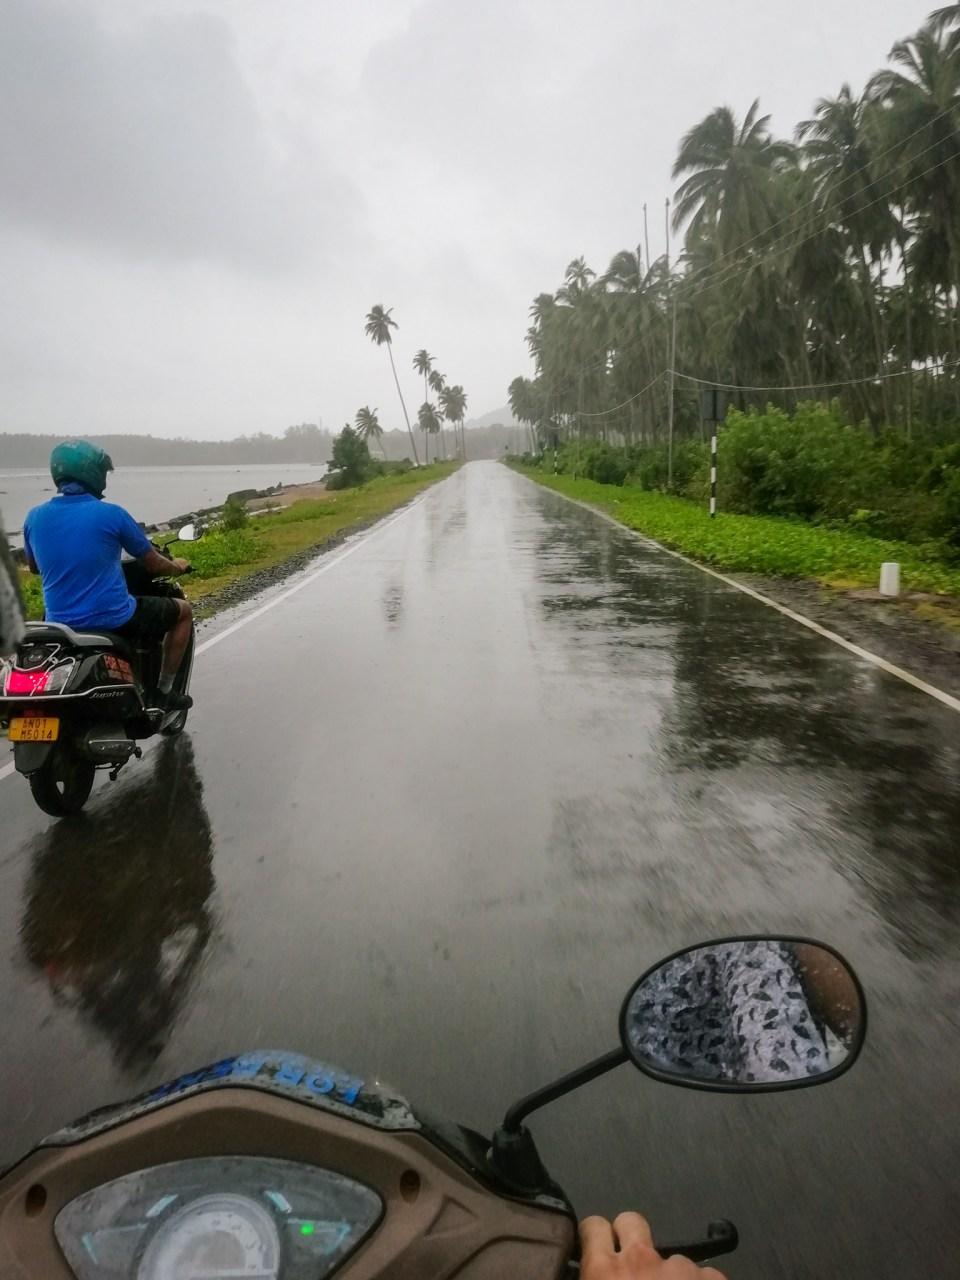 The drive to Chidiya Tapu was pleasing